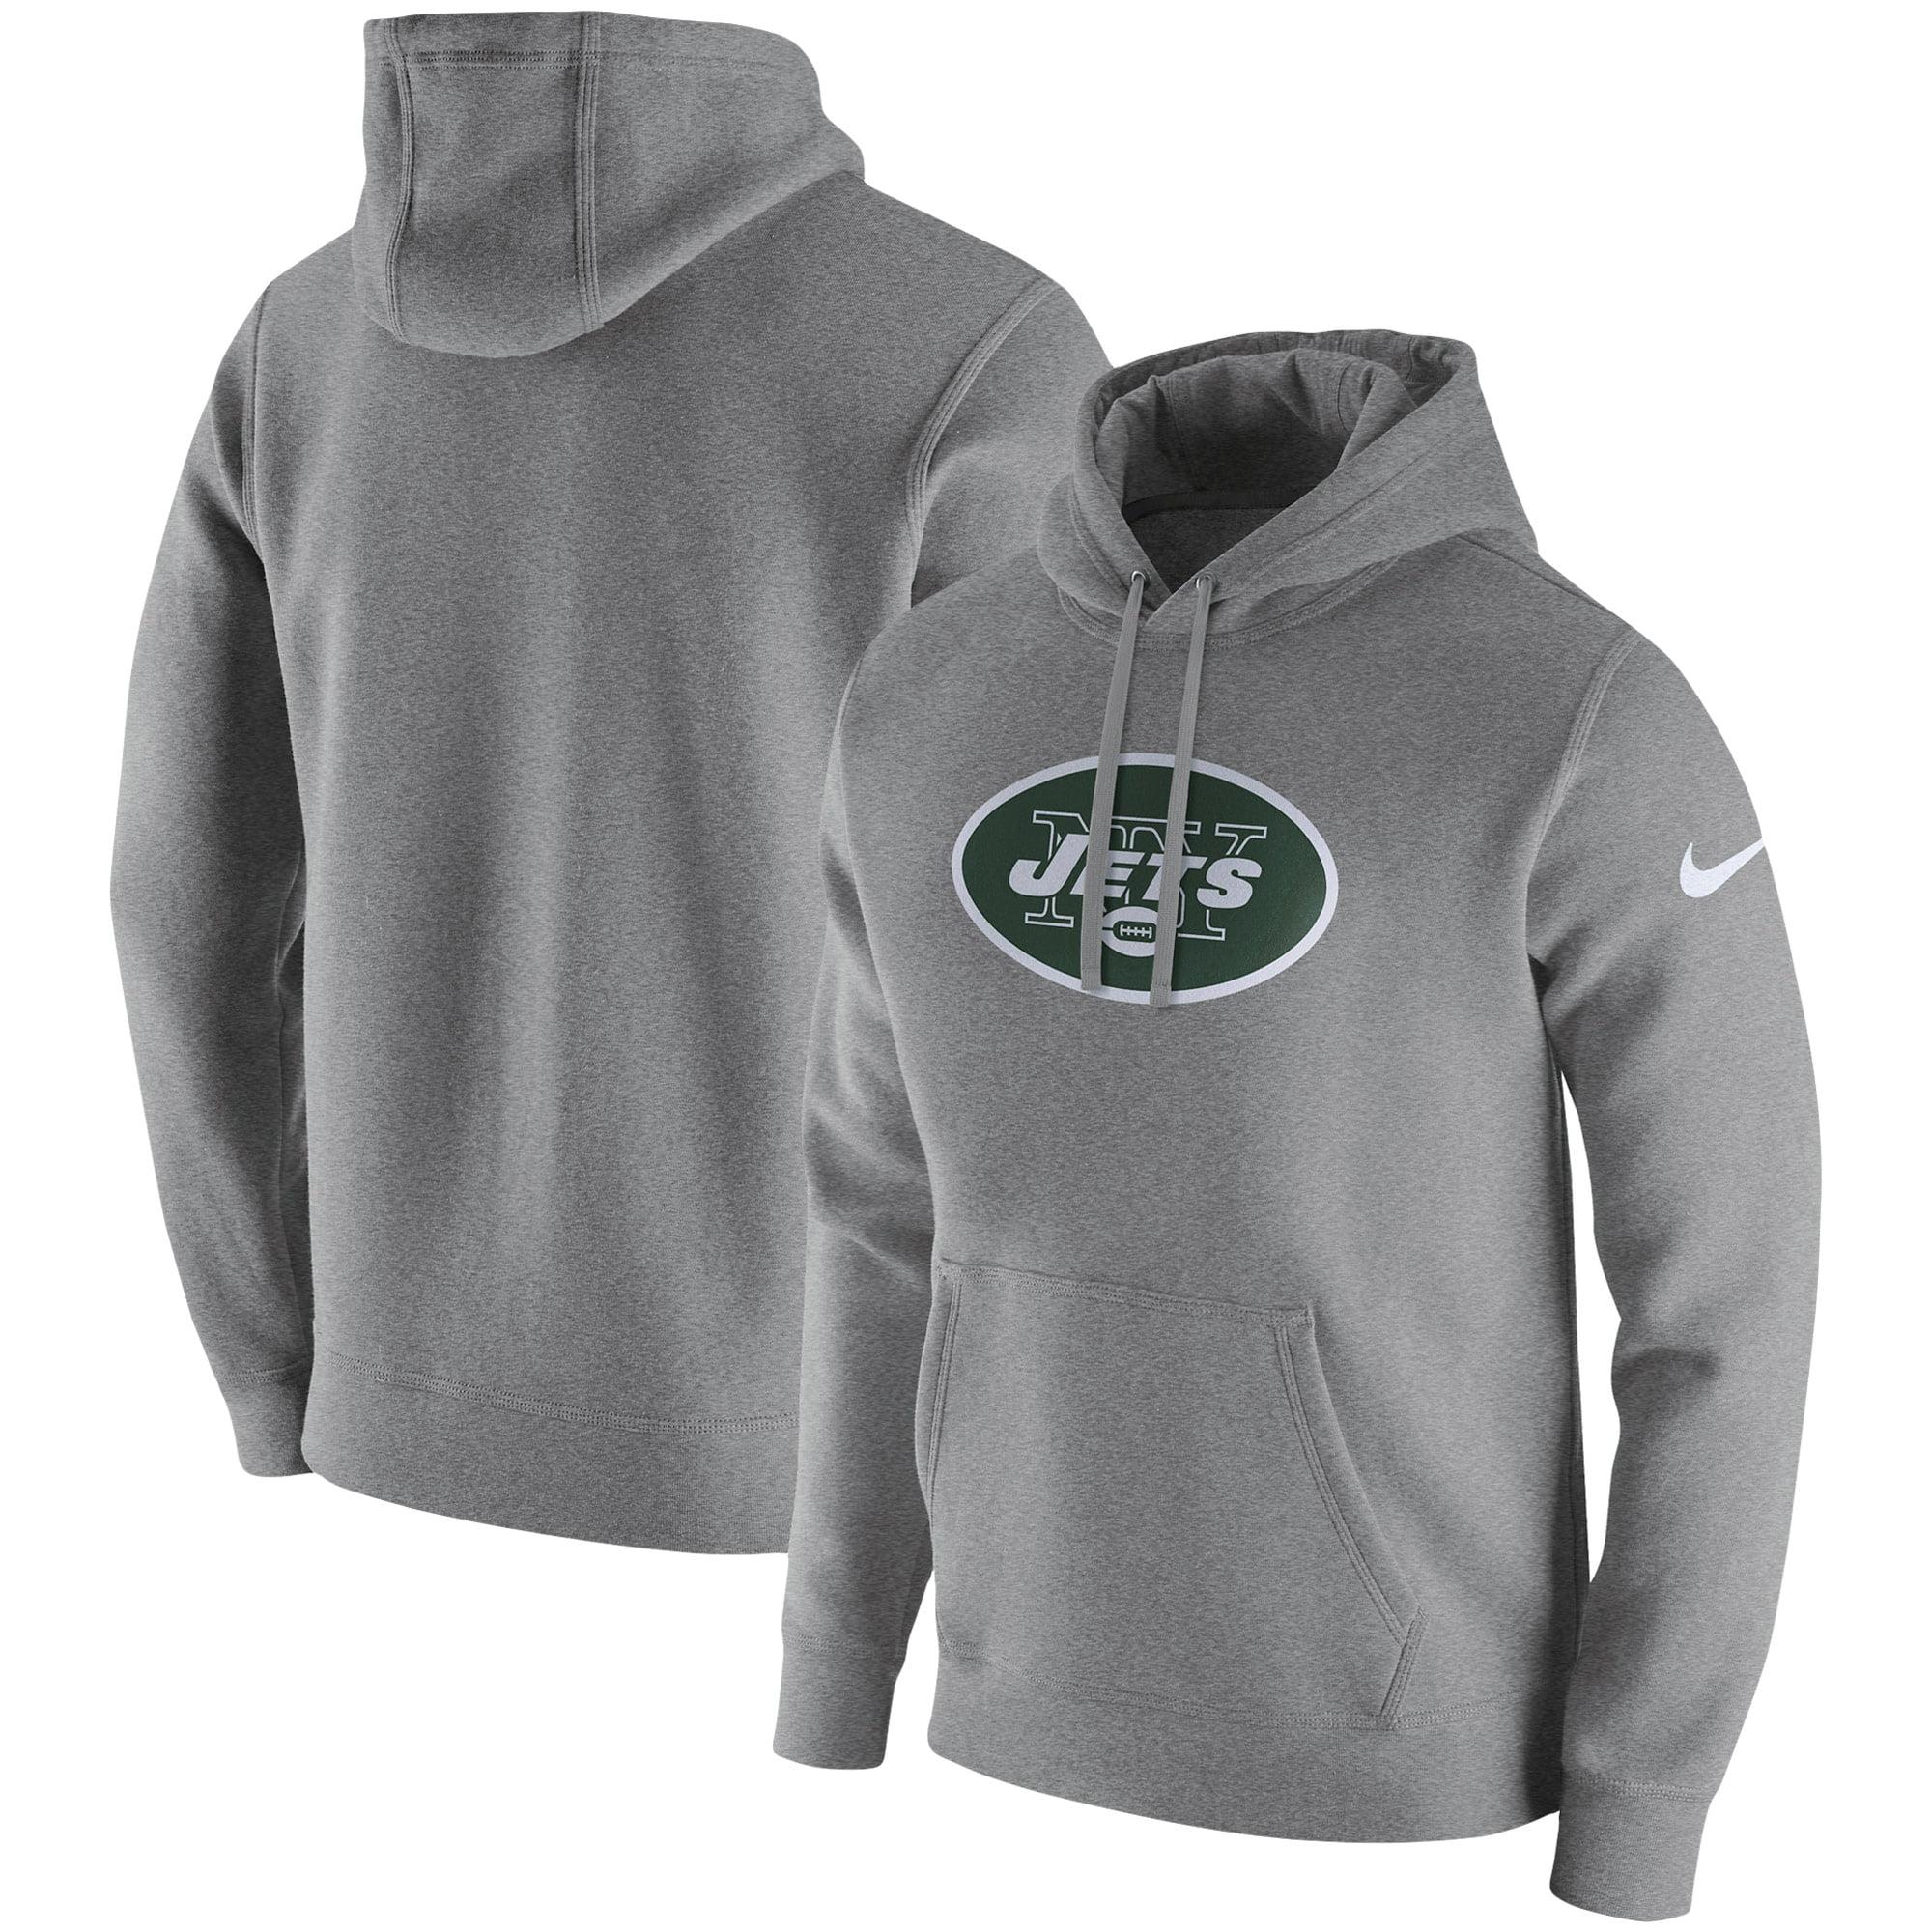 New York Jets Nike Club Fleece Pullover Hoodie - Heathered Gray